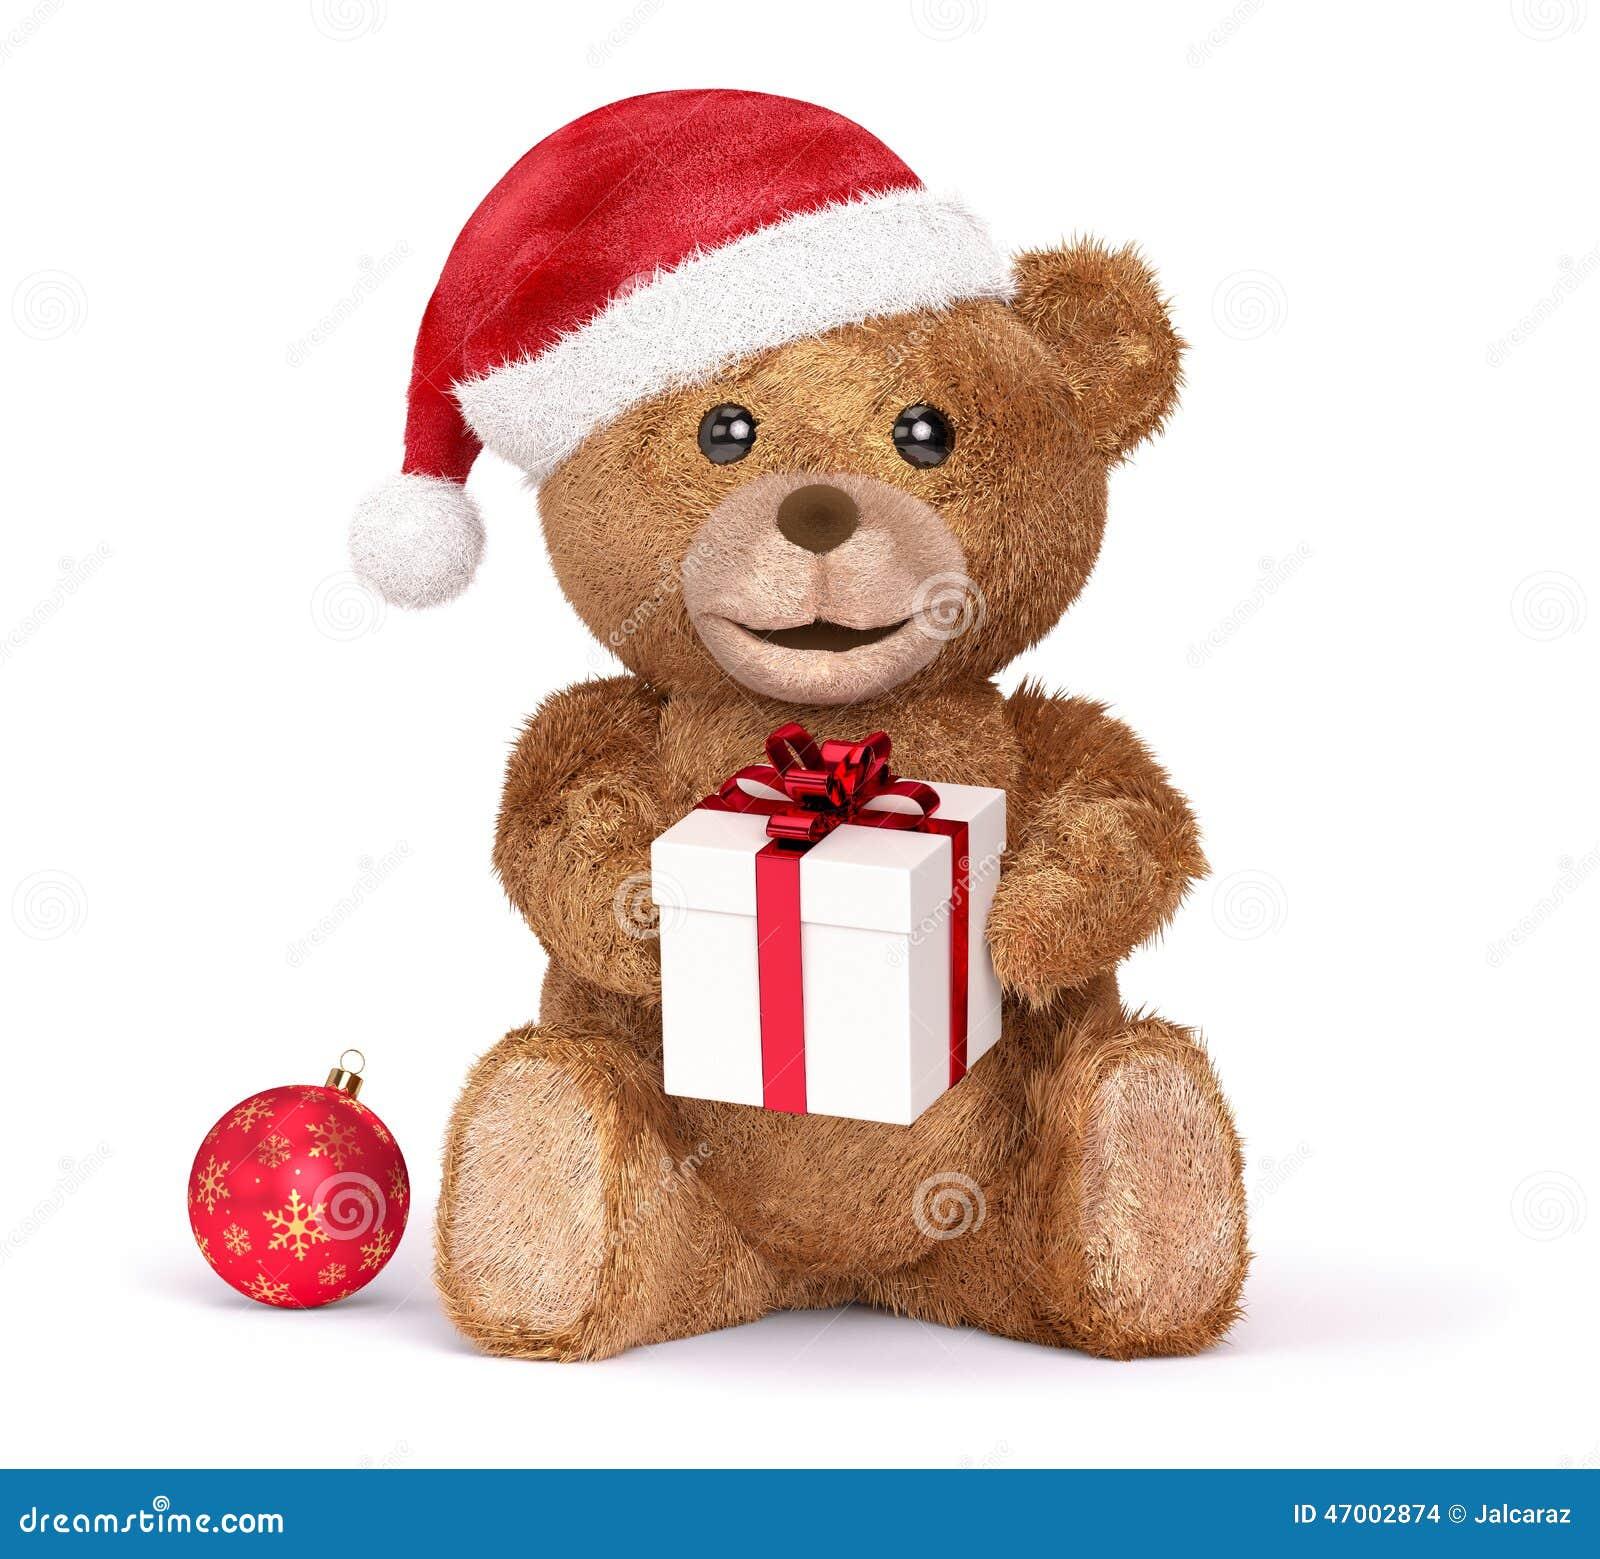 Teddy Weihnachten.Teddy With A Christmas Stock Photo 47002874 Megapixl